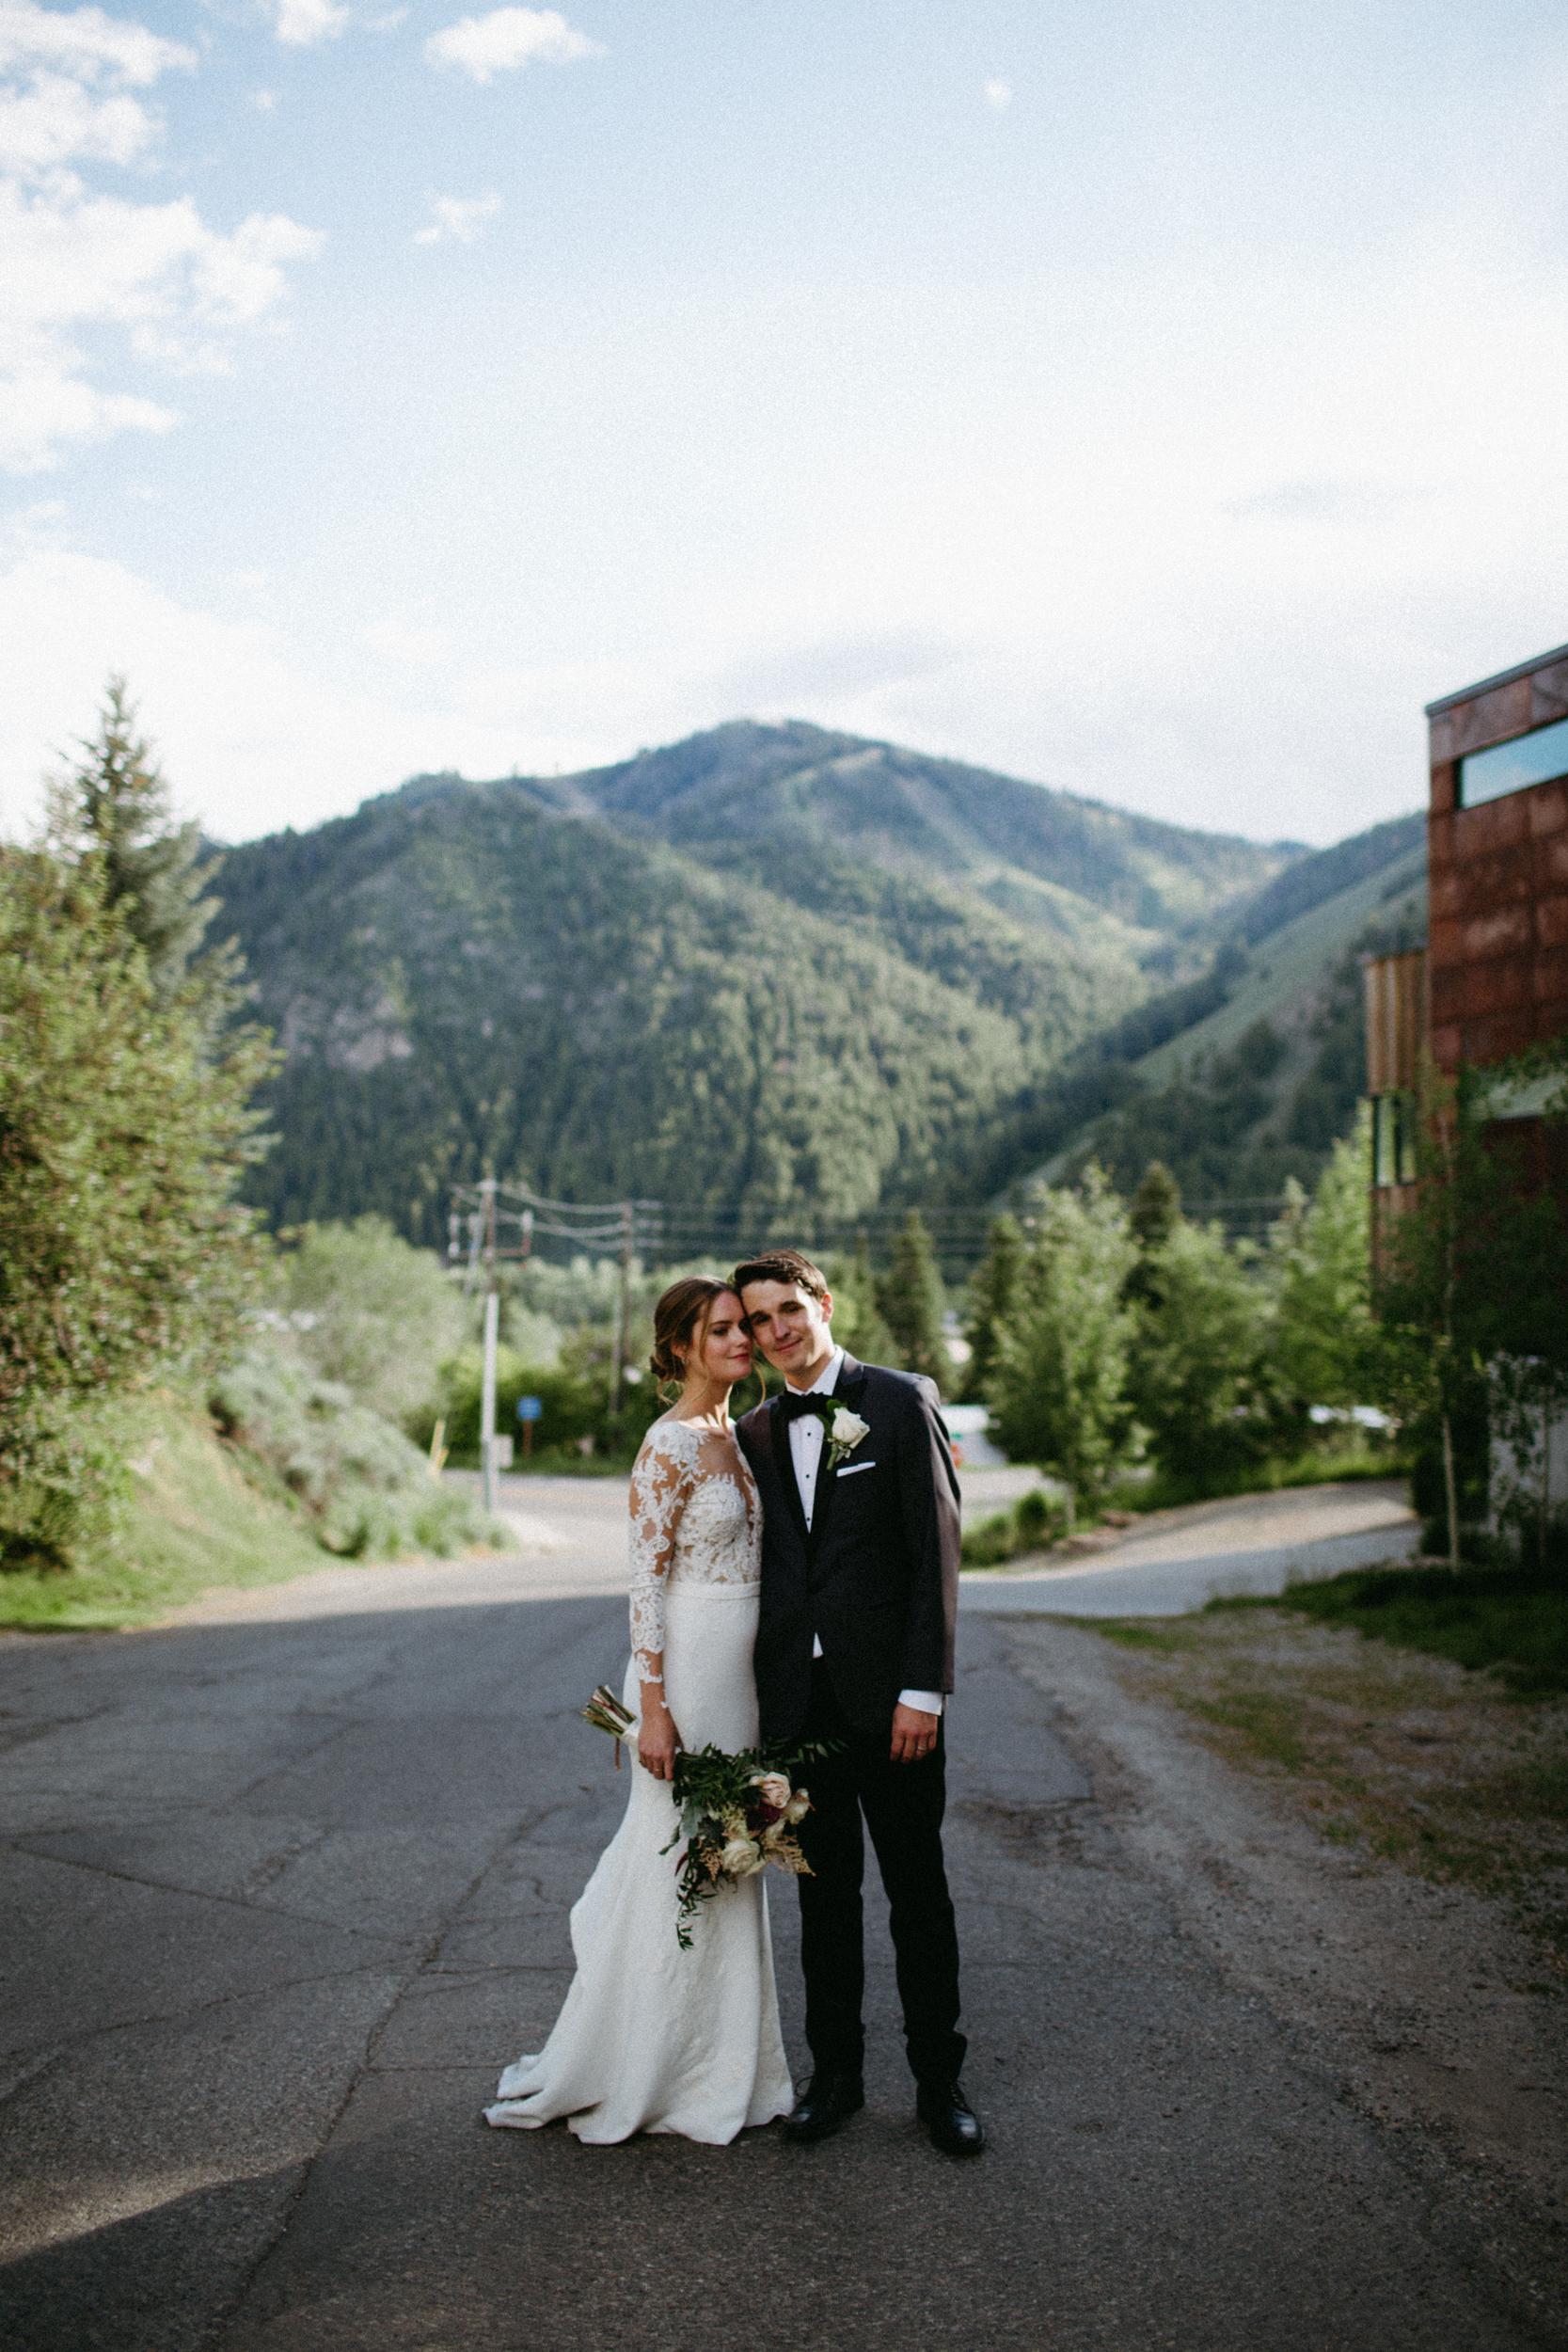 knob-hill-wedding-christinemarie-sun-valley-86.jpg